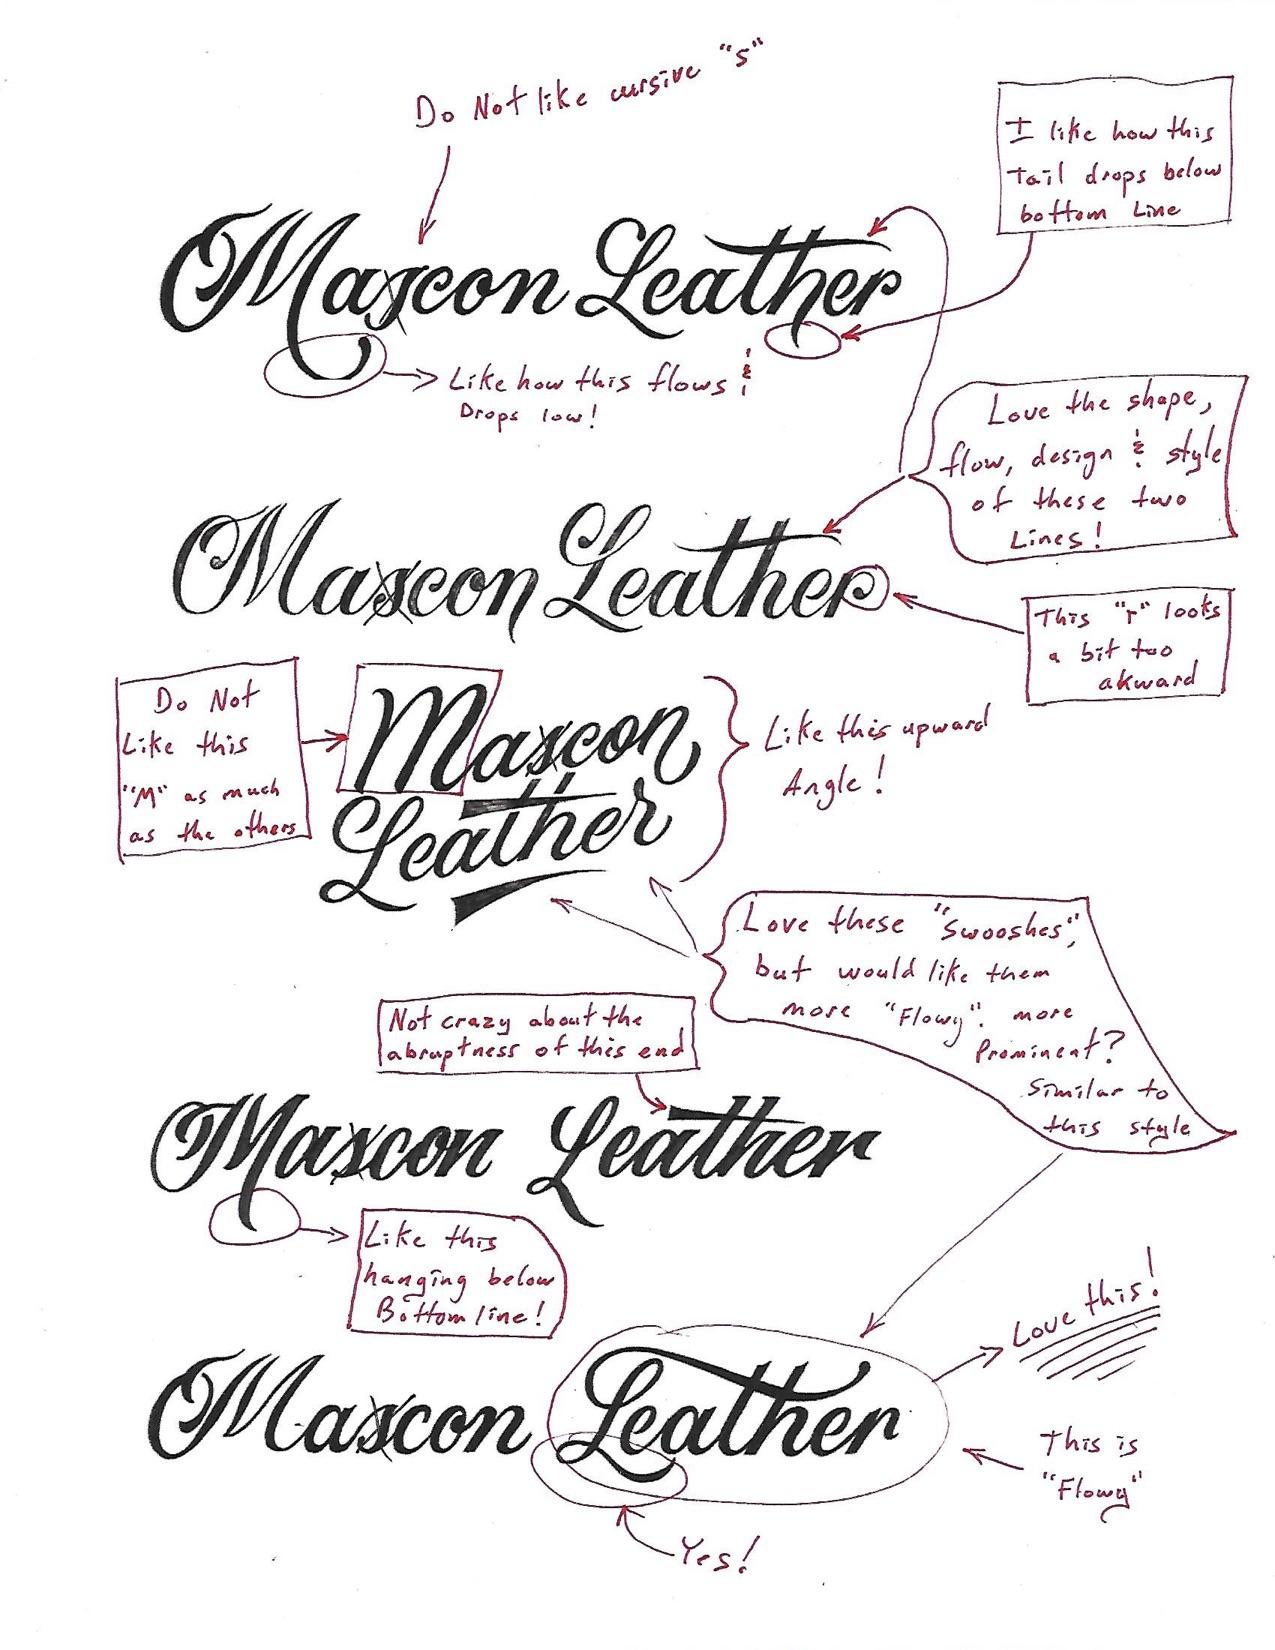 mascon logos write up 8-9-2017.jpg